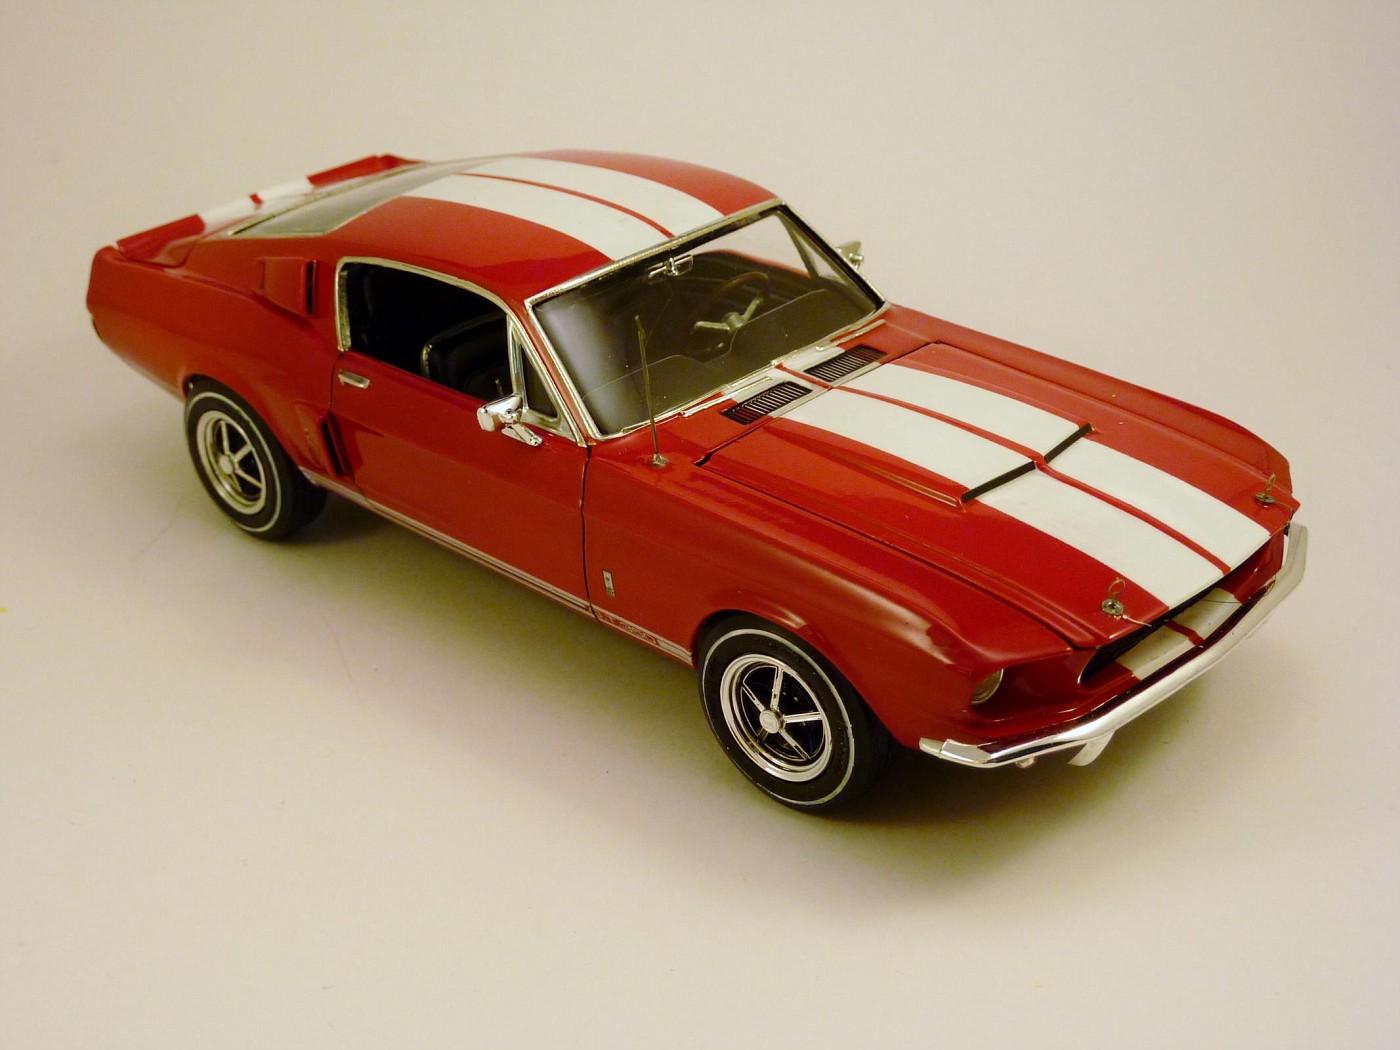 projet Mustang shelby gt 500 1969 terminée Photo4-vi